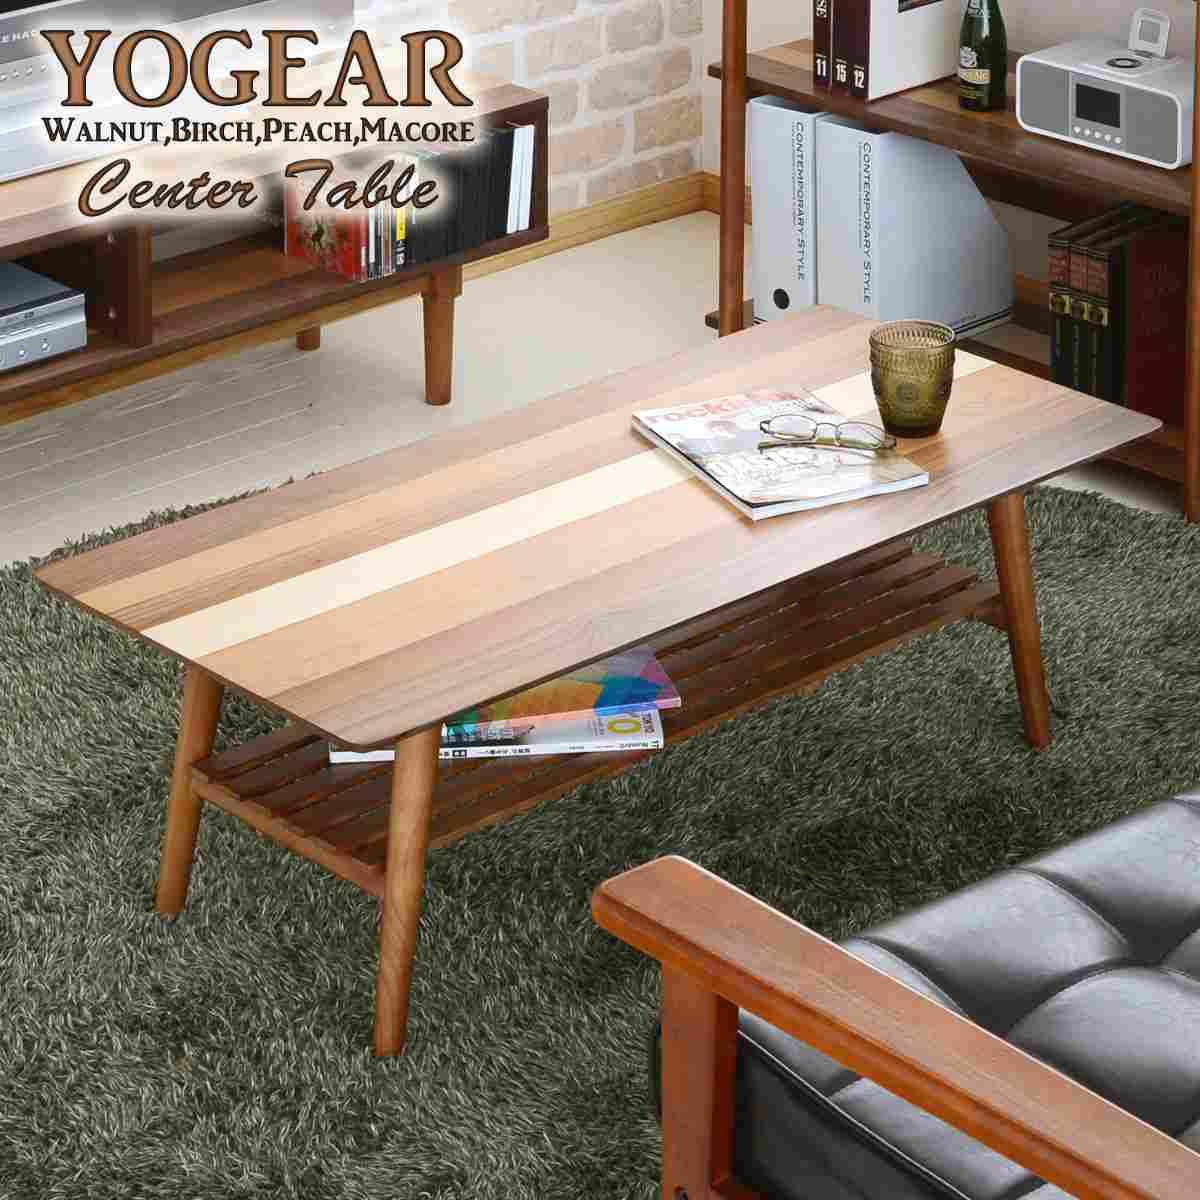 yogear ヨギア  センターテーブル yoct-100の写真